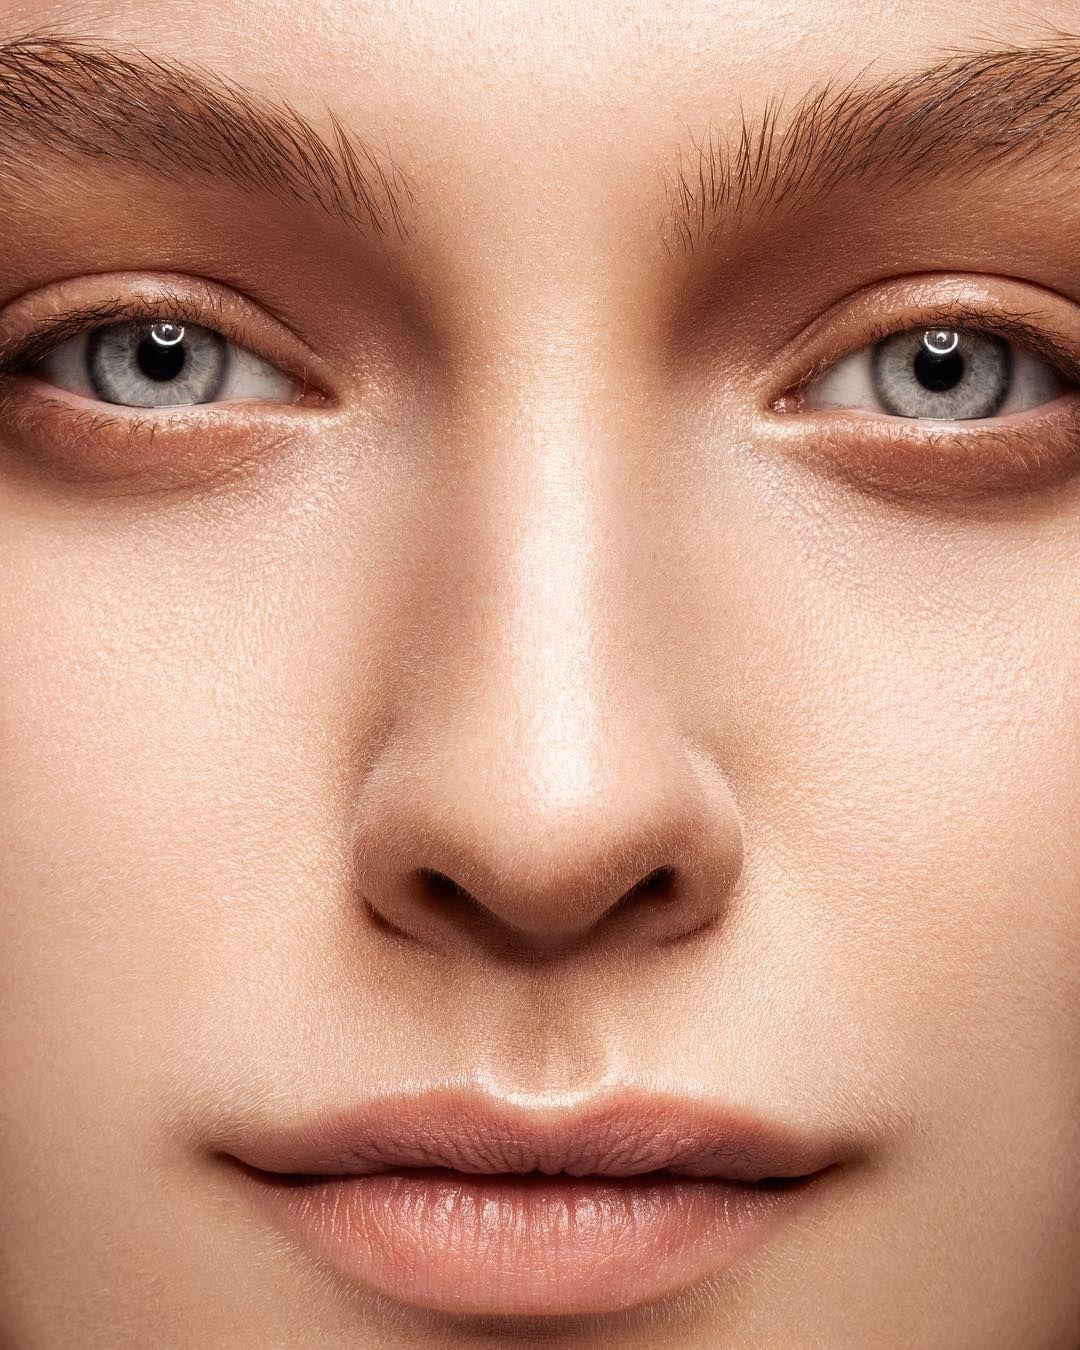 Pin by Bri Soffa on Brandy Professional makeup artist